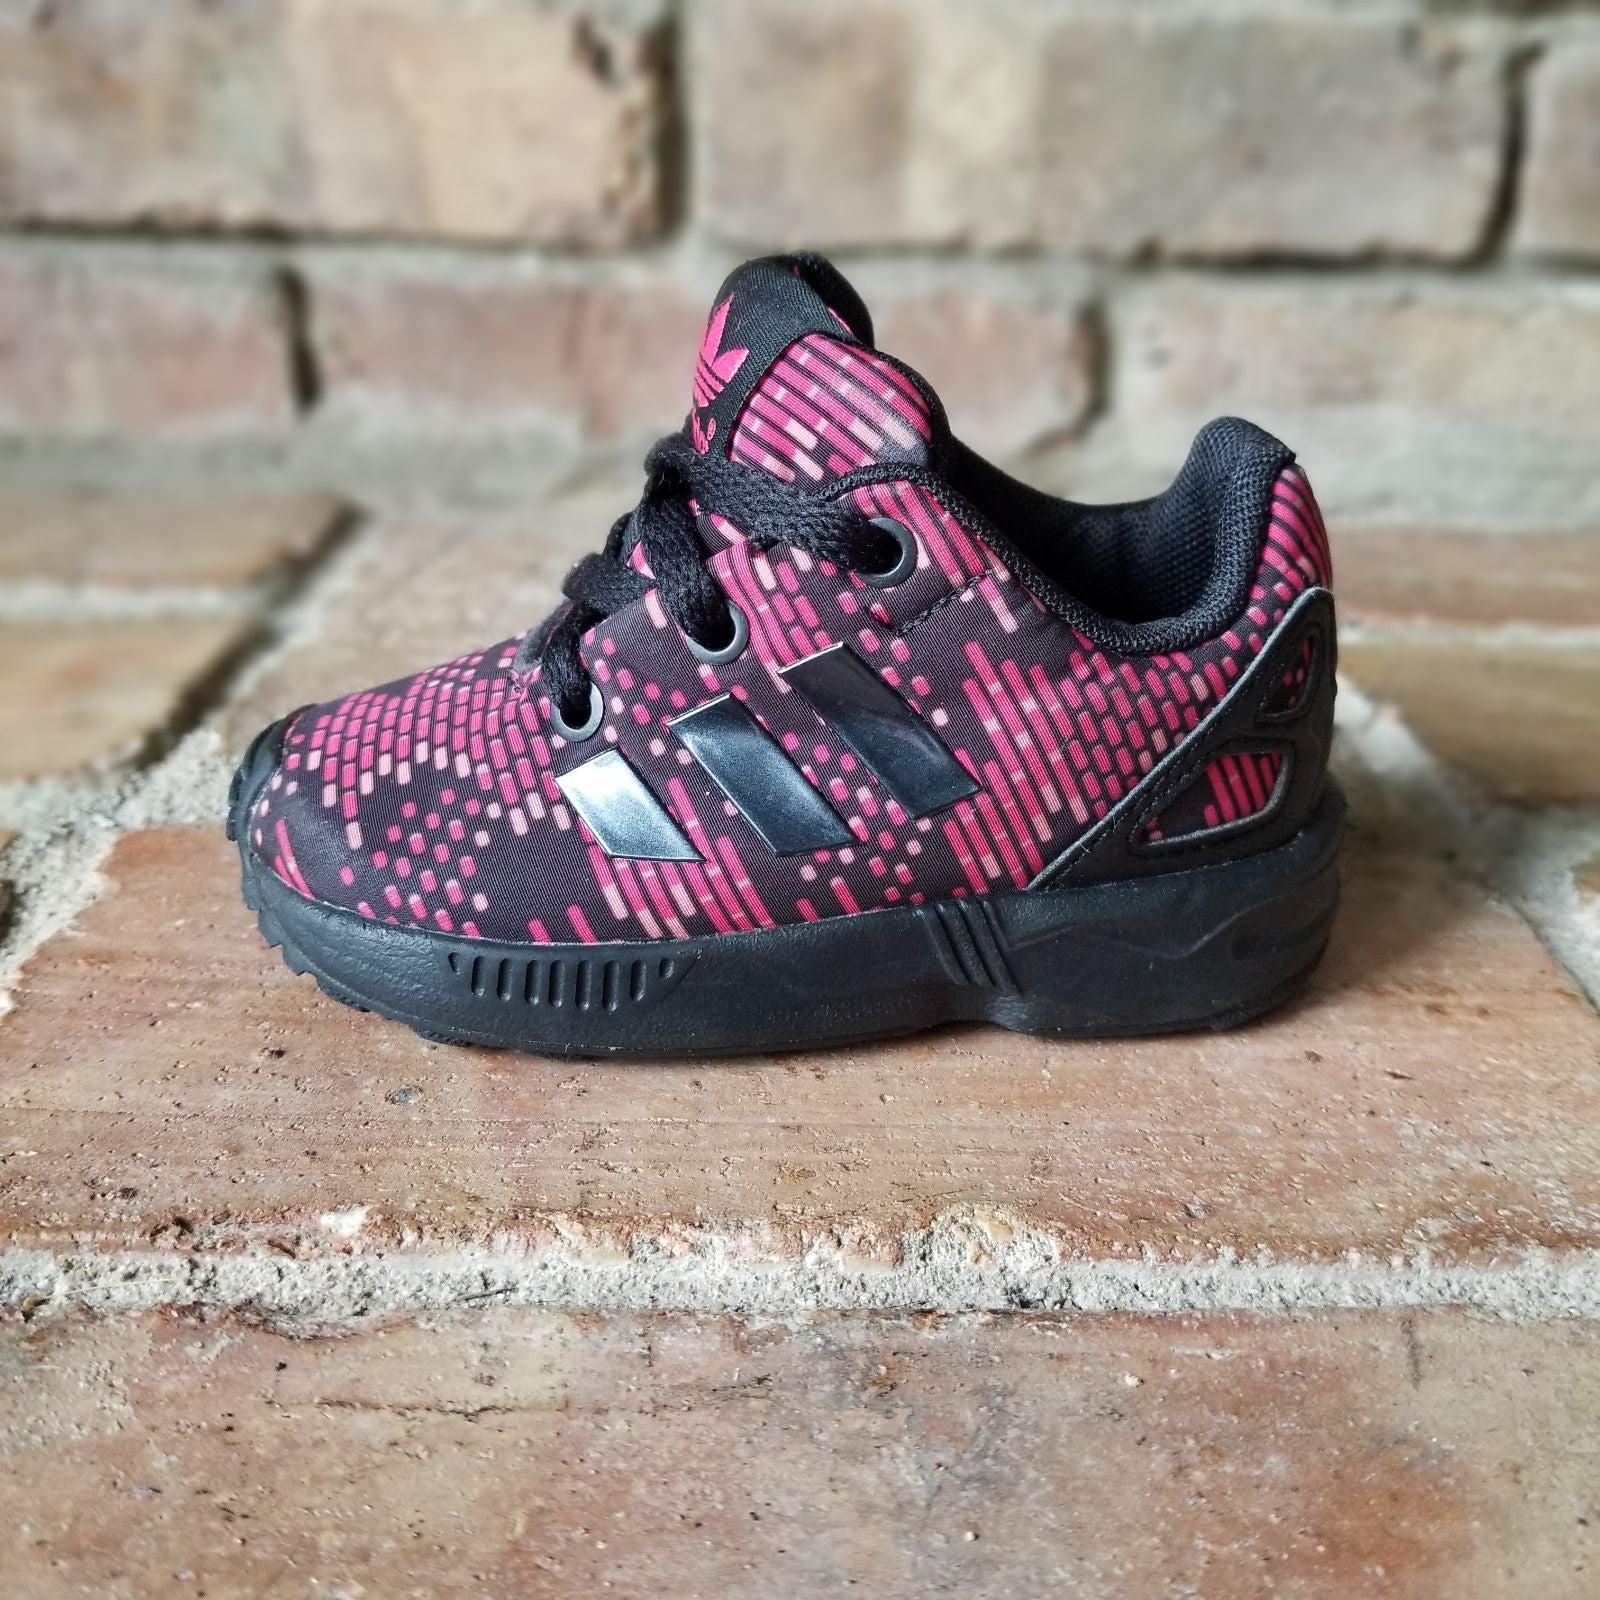 Adidas Torsion ZX Flux Comfort Athletic